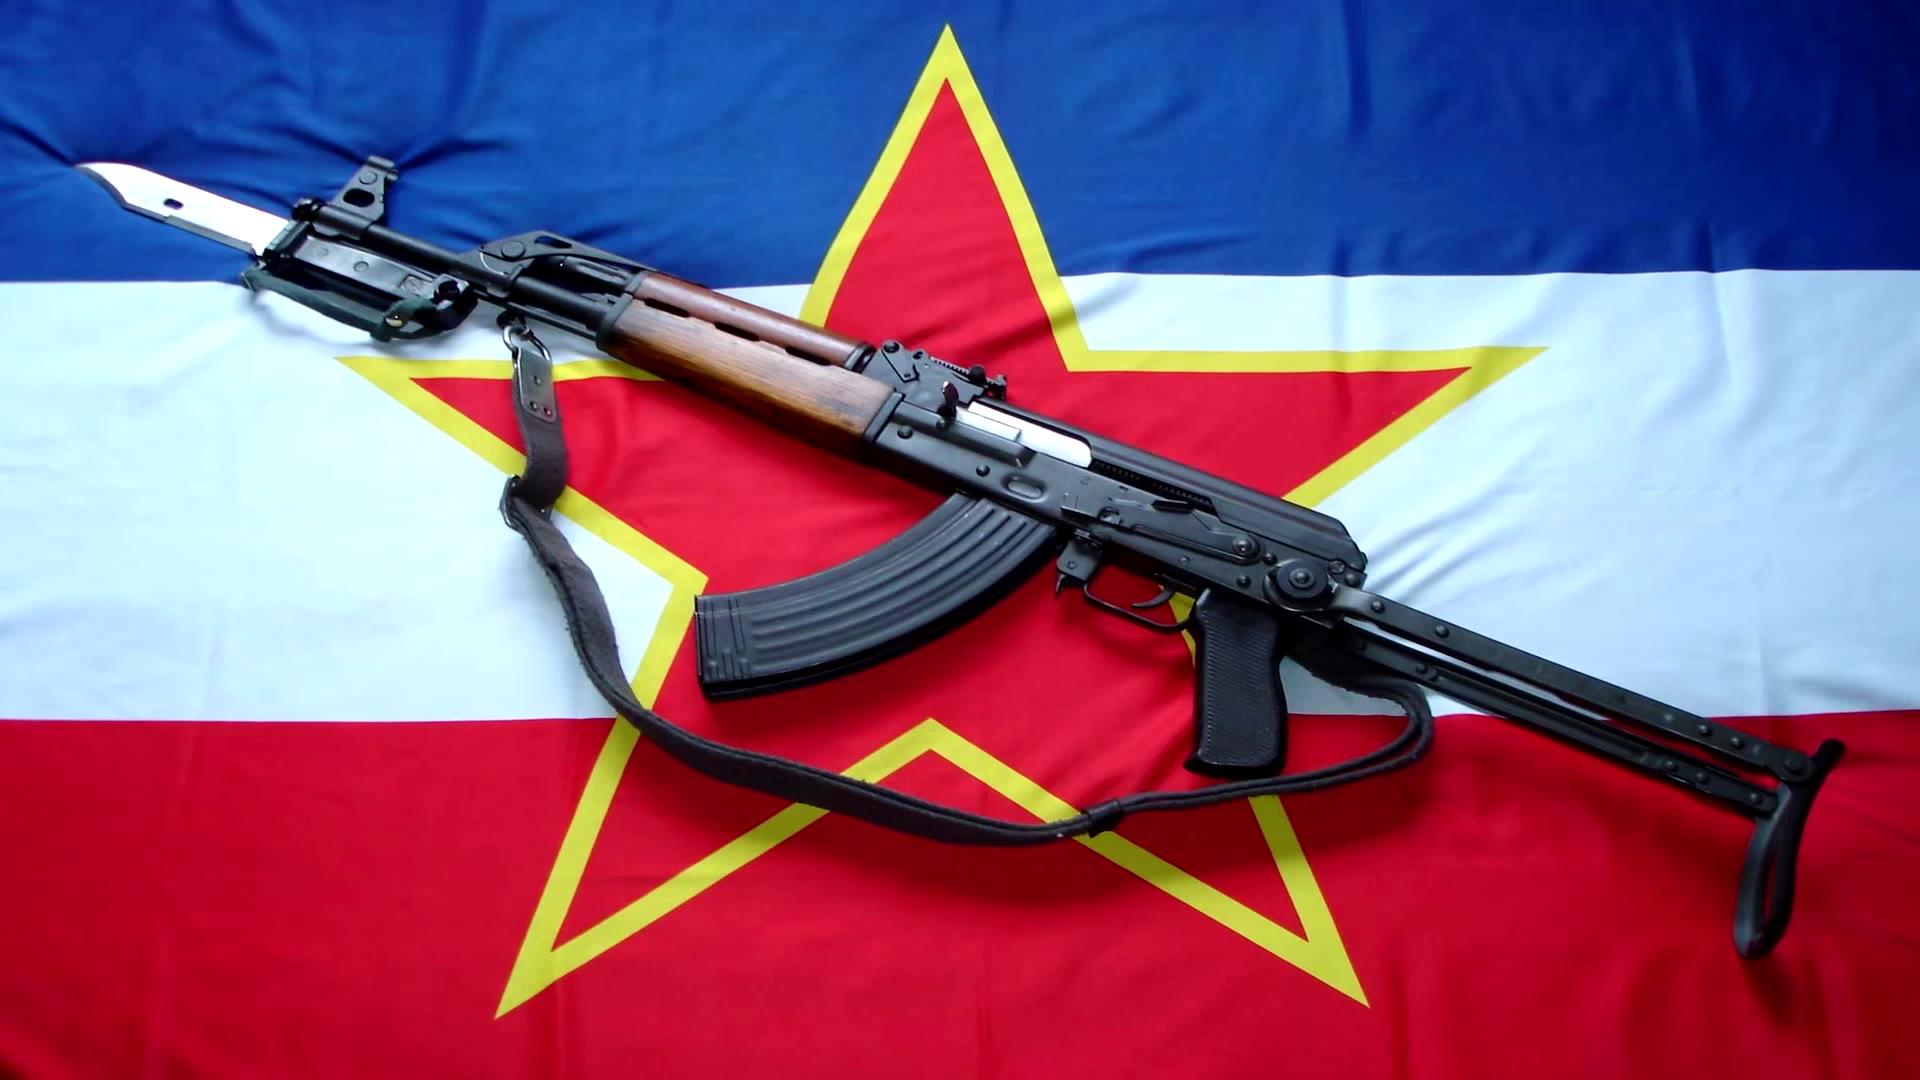 【GETchan】南斯拉夫共产主义音乐一小时